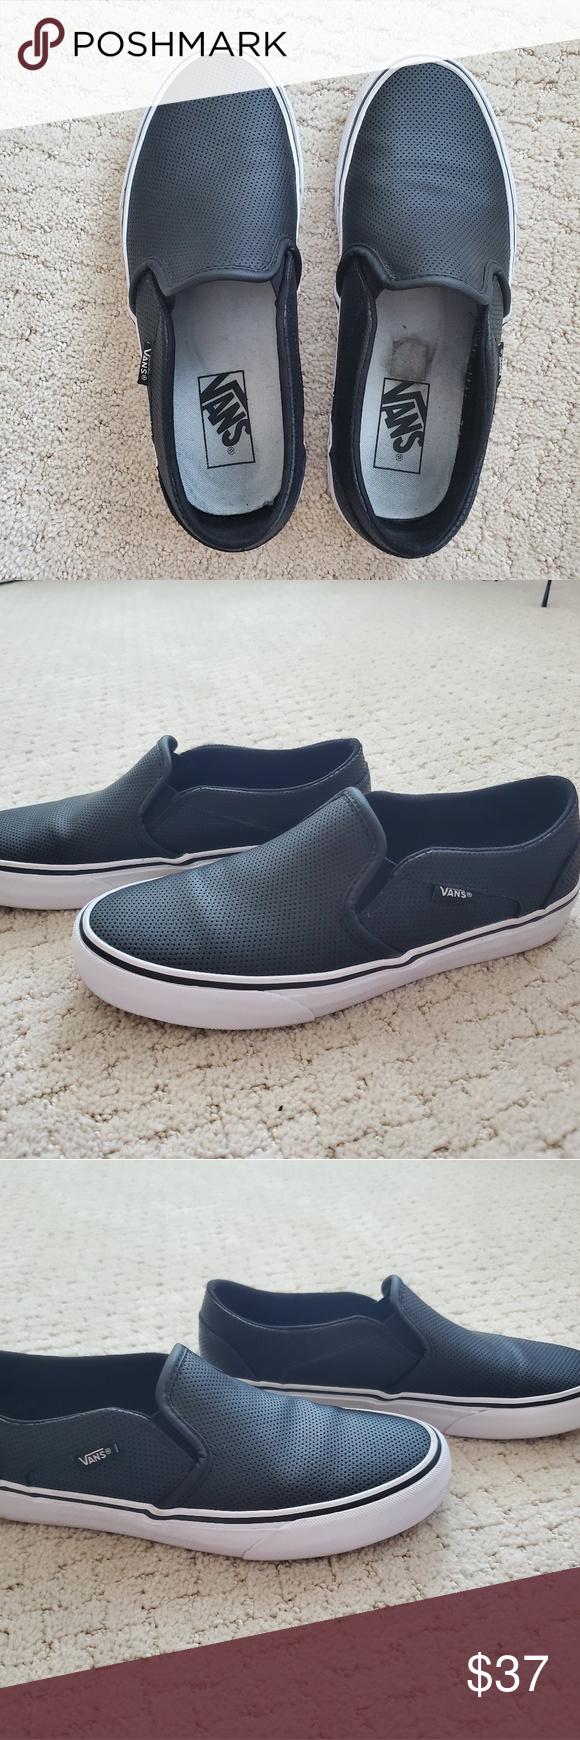 Slip on Vans shoes Vans #721494 The